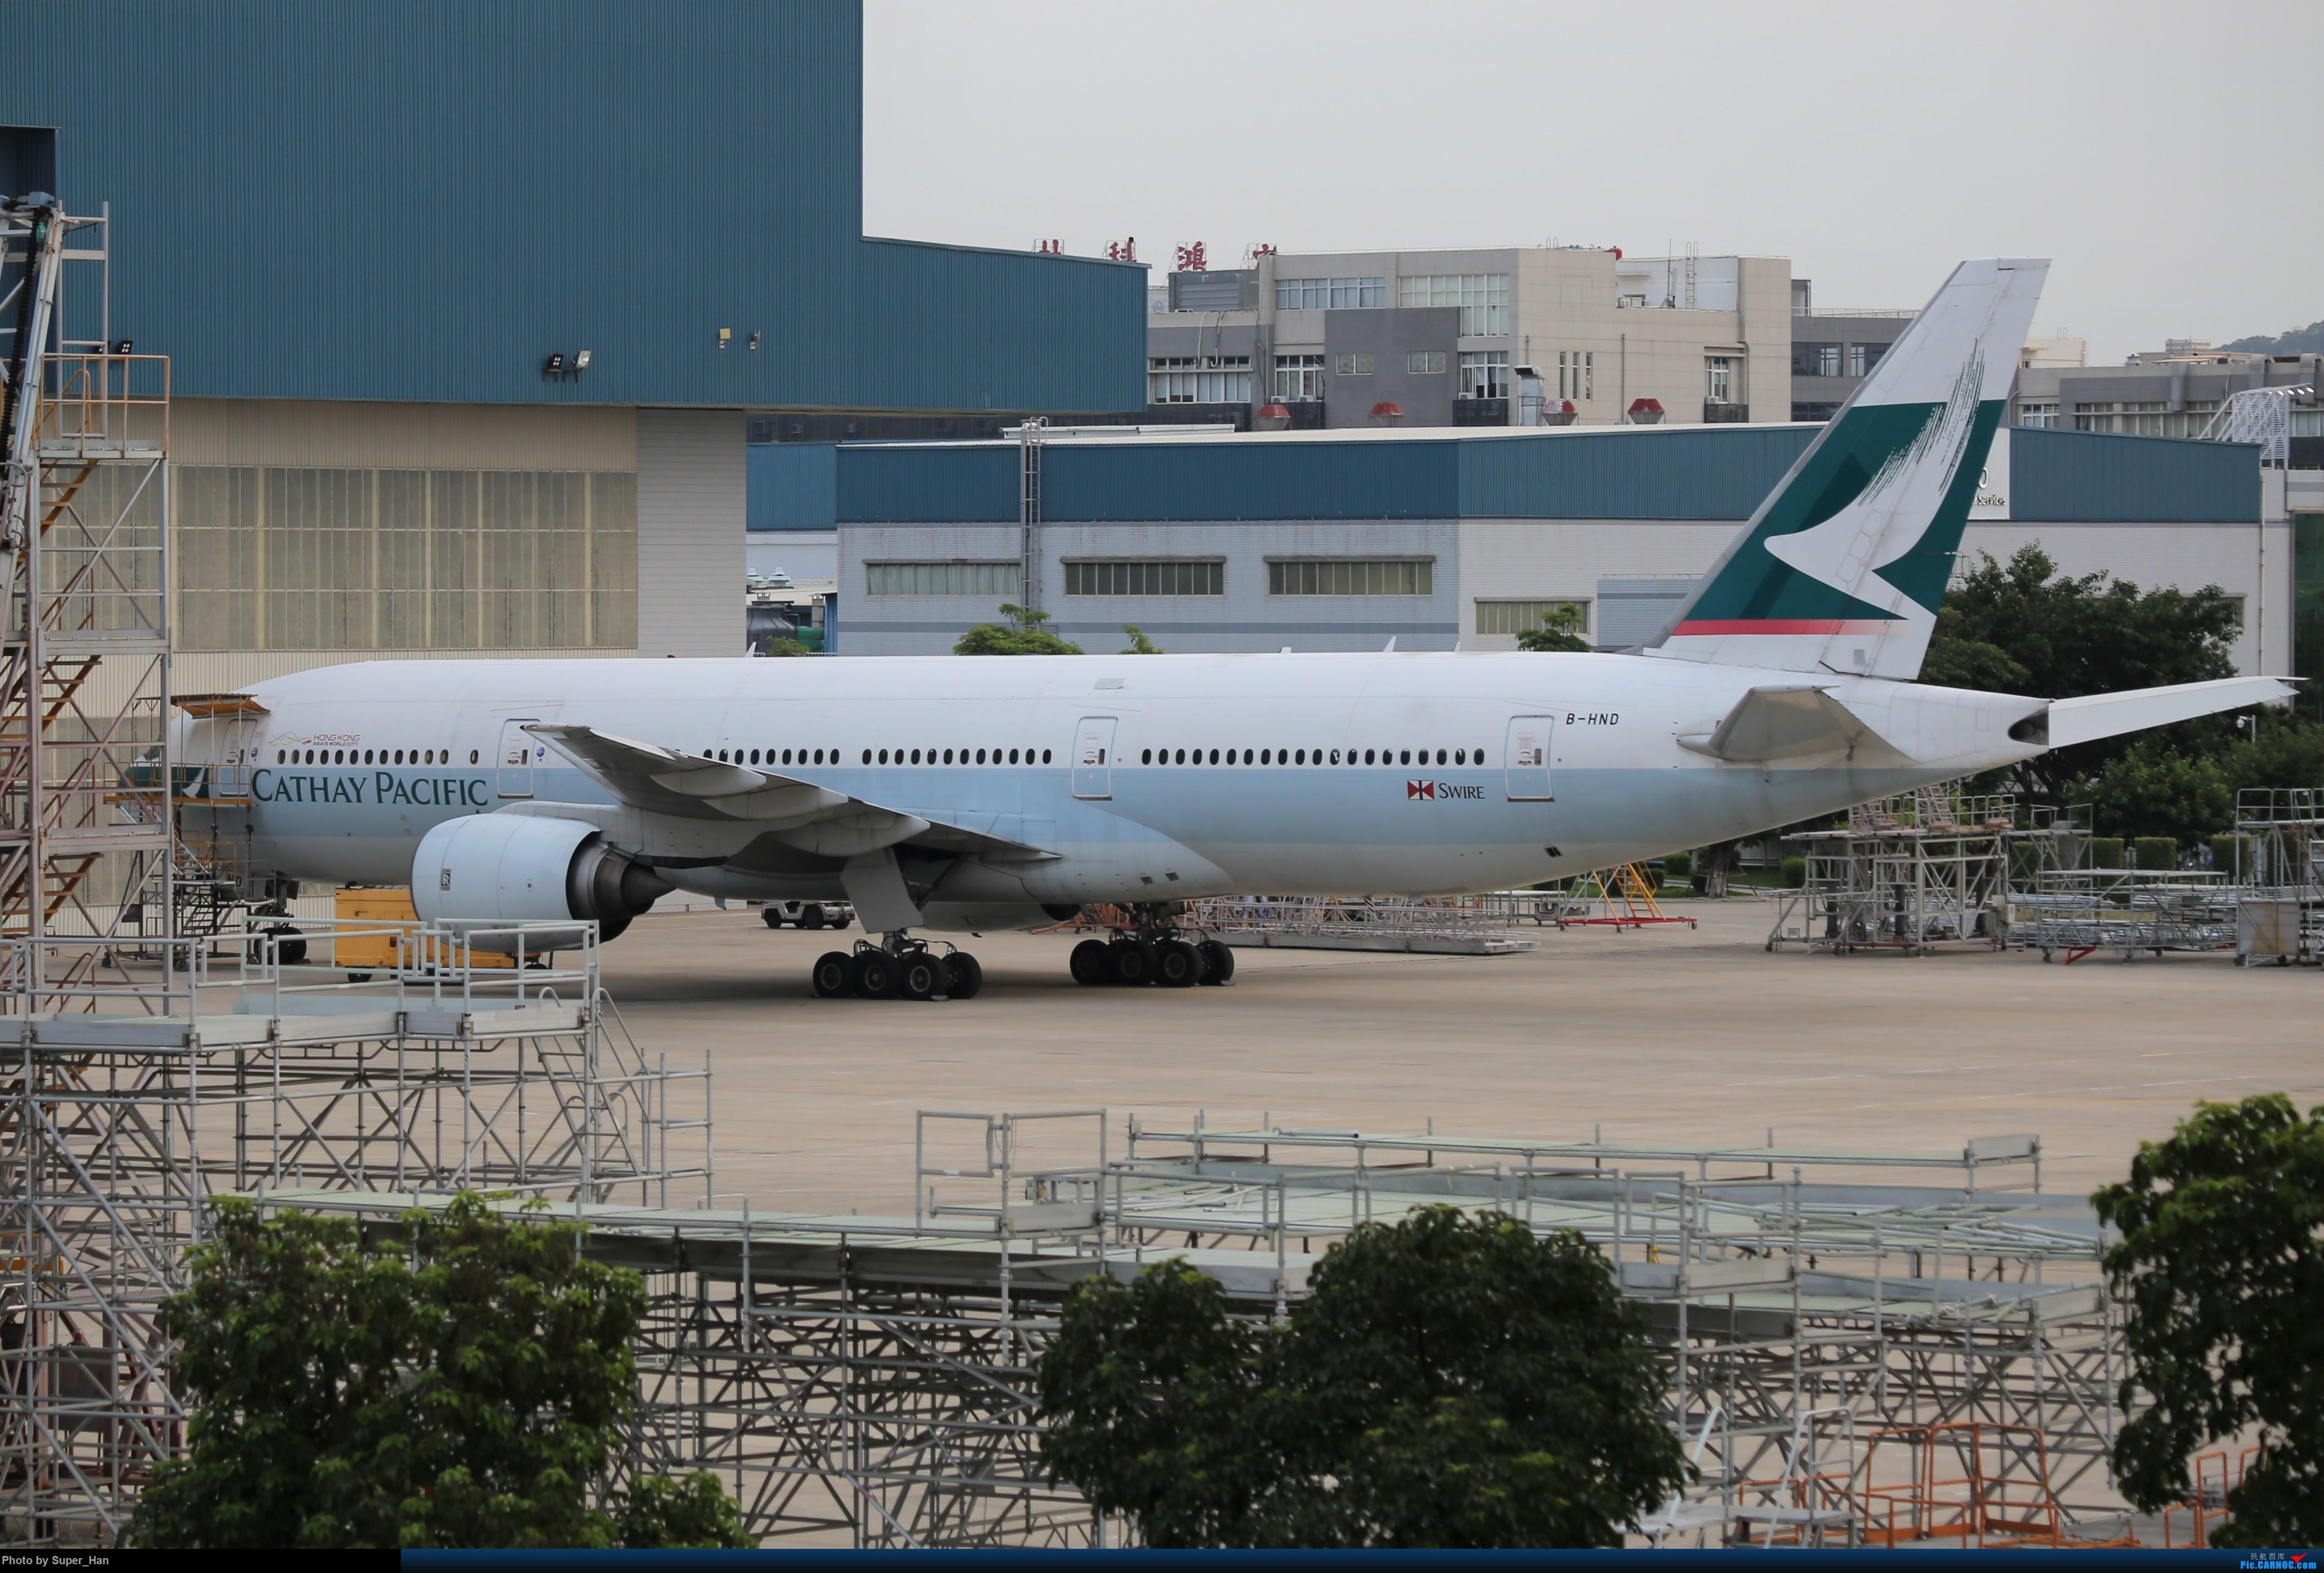 Re:[原创]0831初访XMN BOEING 777-200 B-HND 中国厦门高崎国际机场